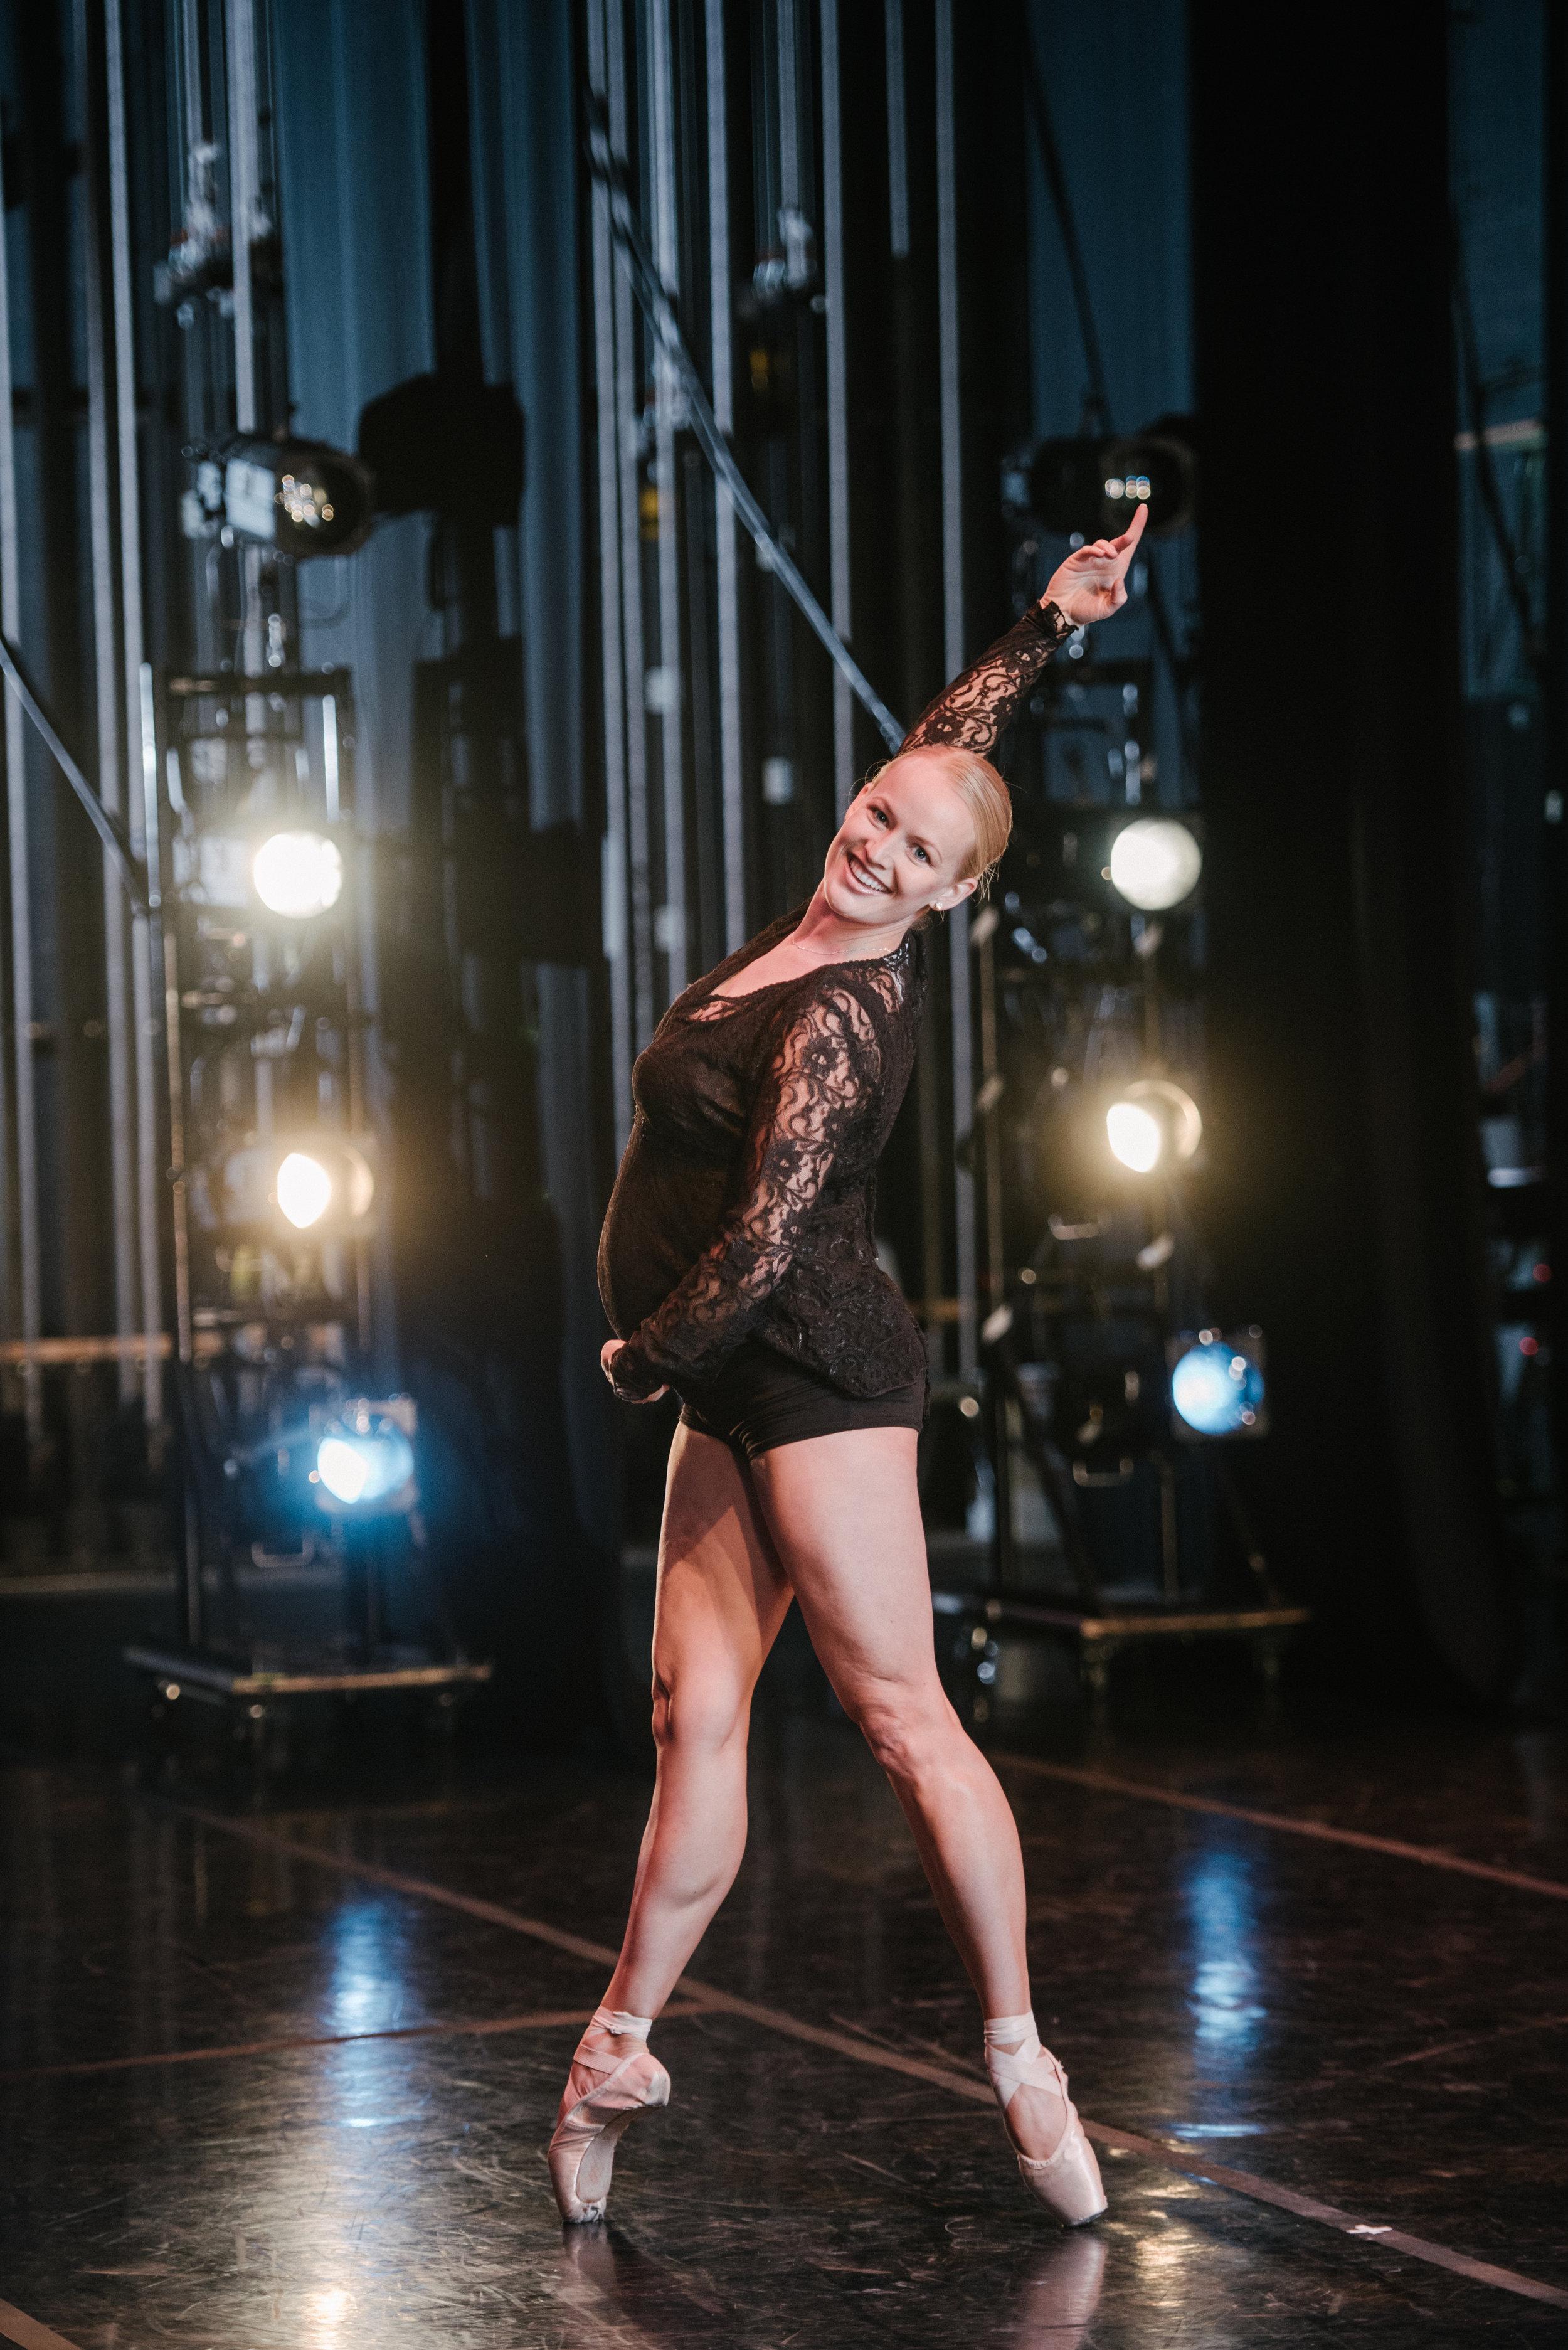 dance-balerina-maternity-photography-logan-utah